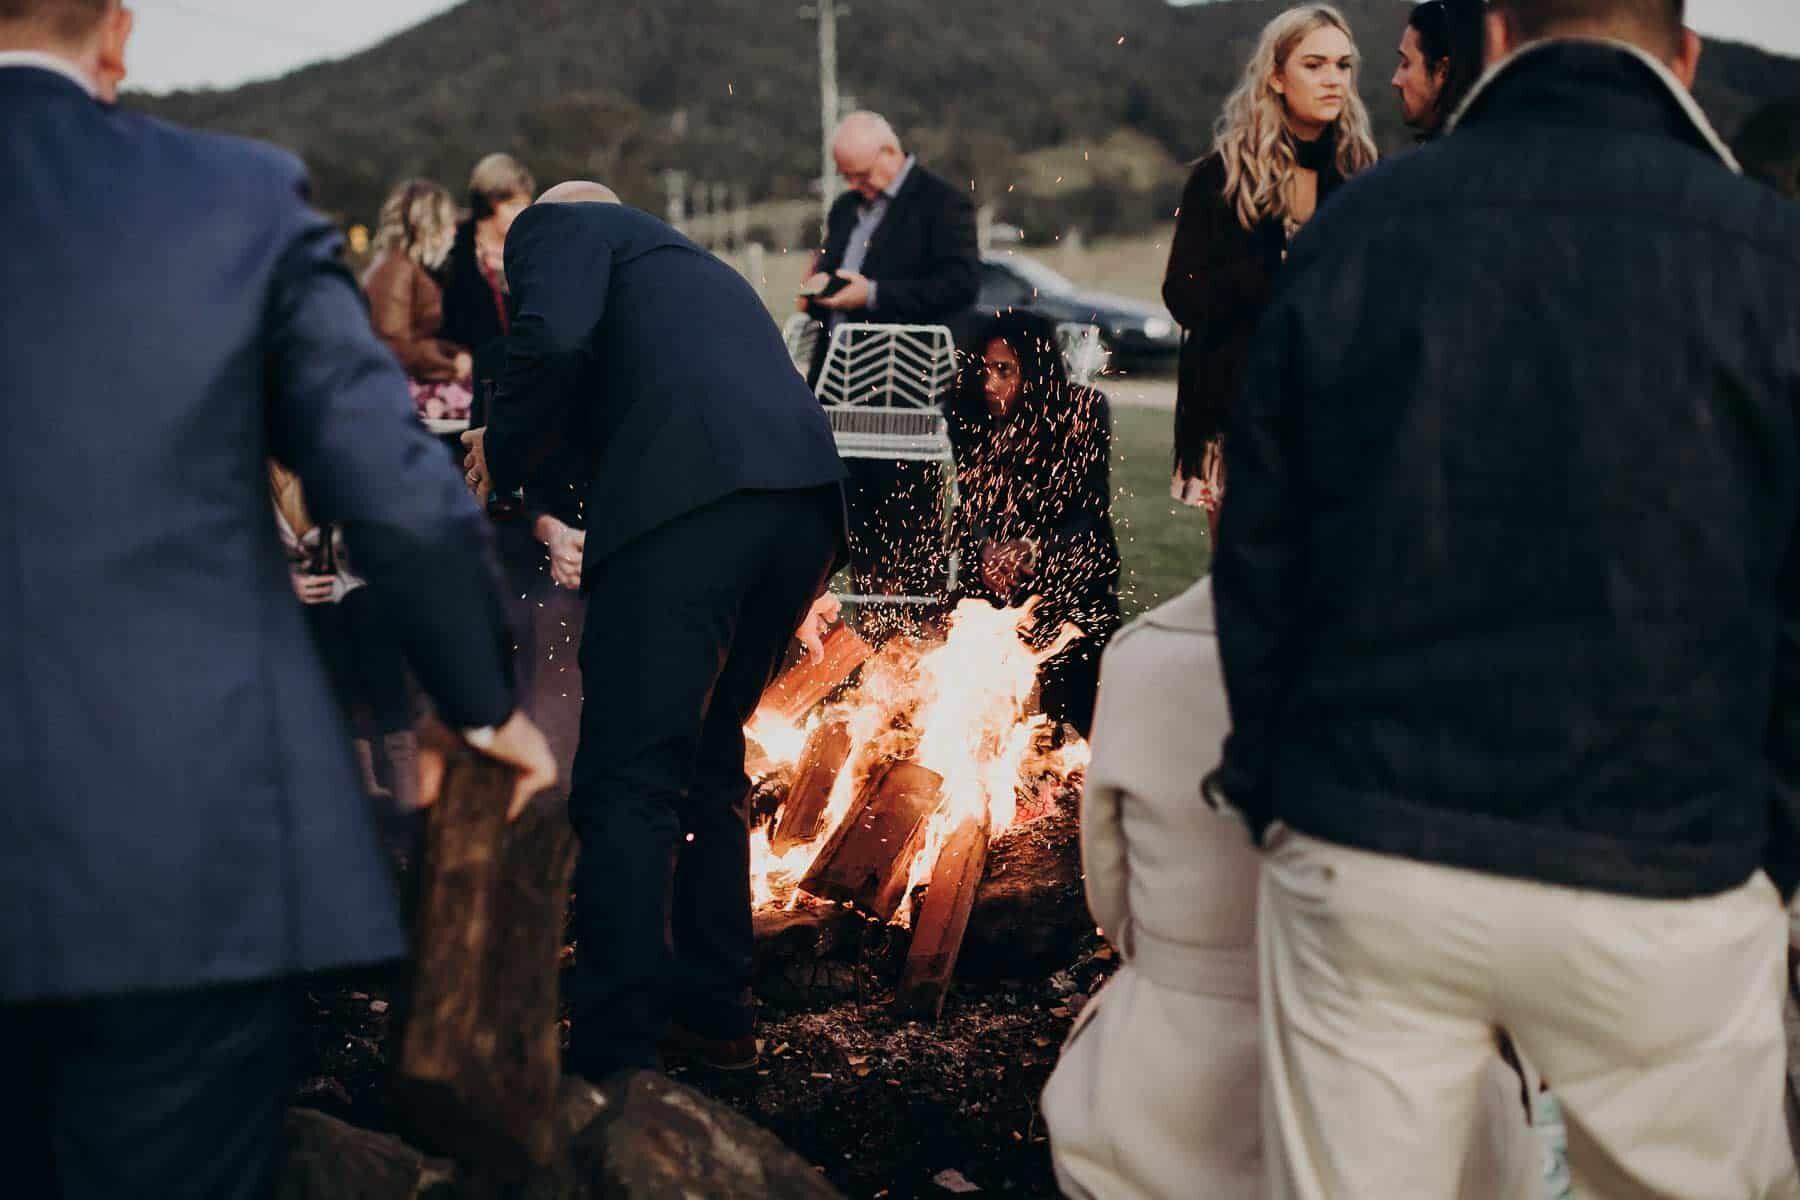 rutic outdoor wedding with bonfire